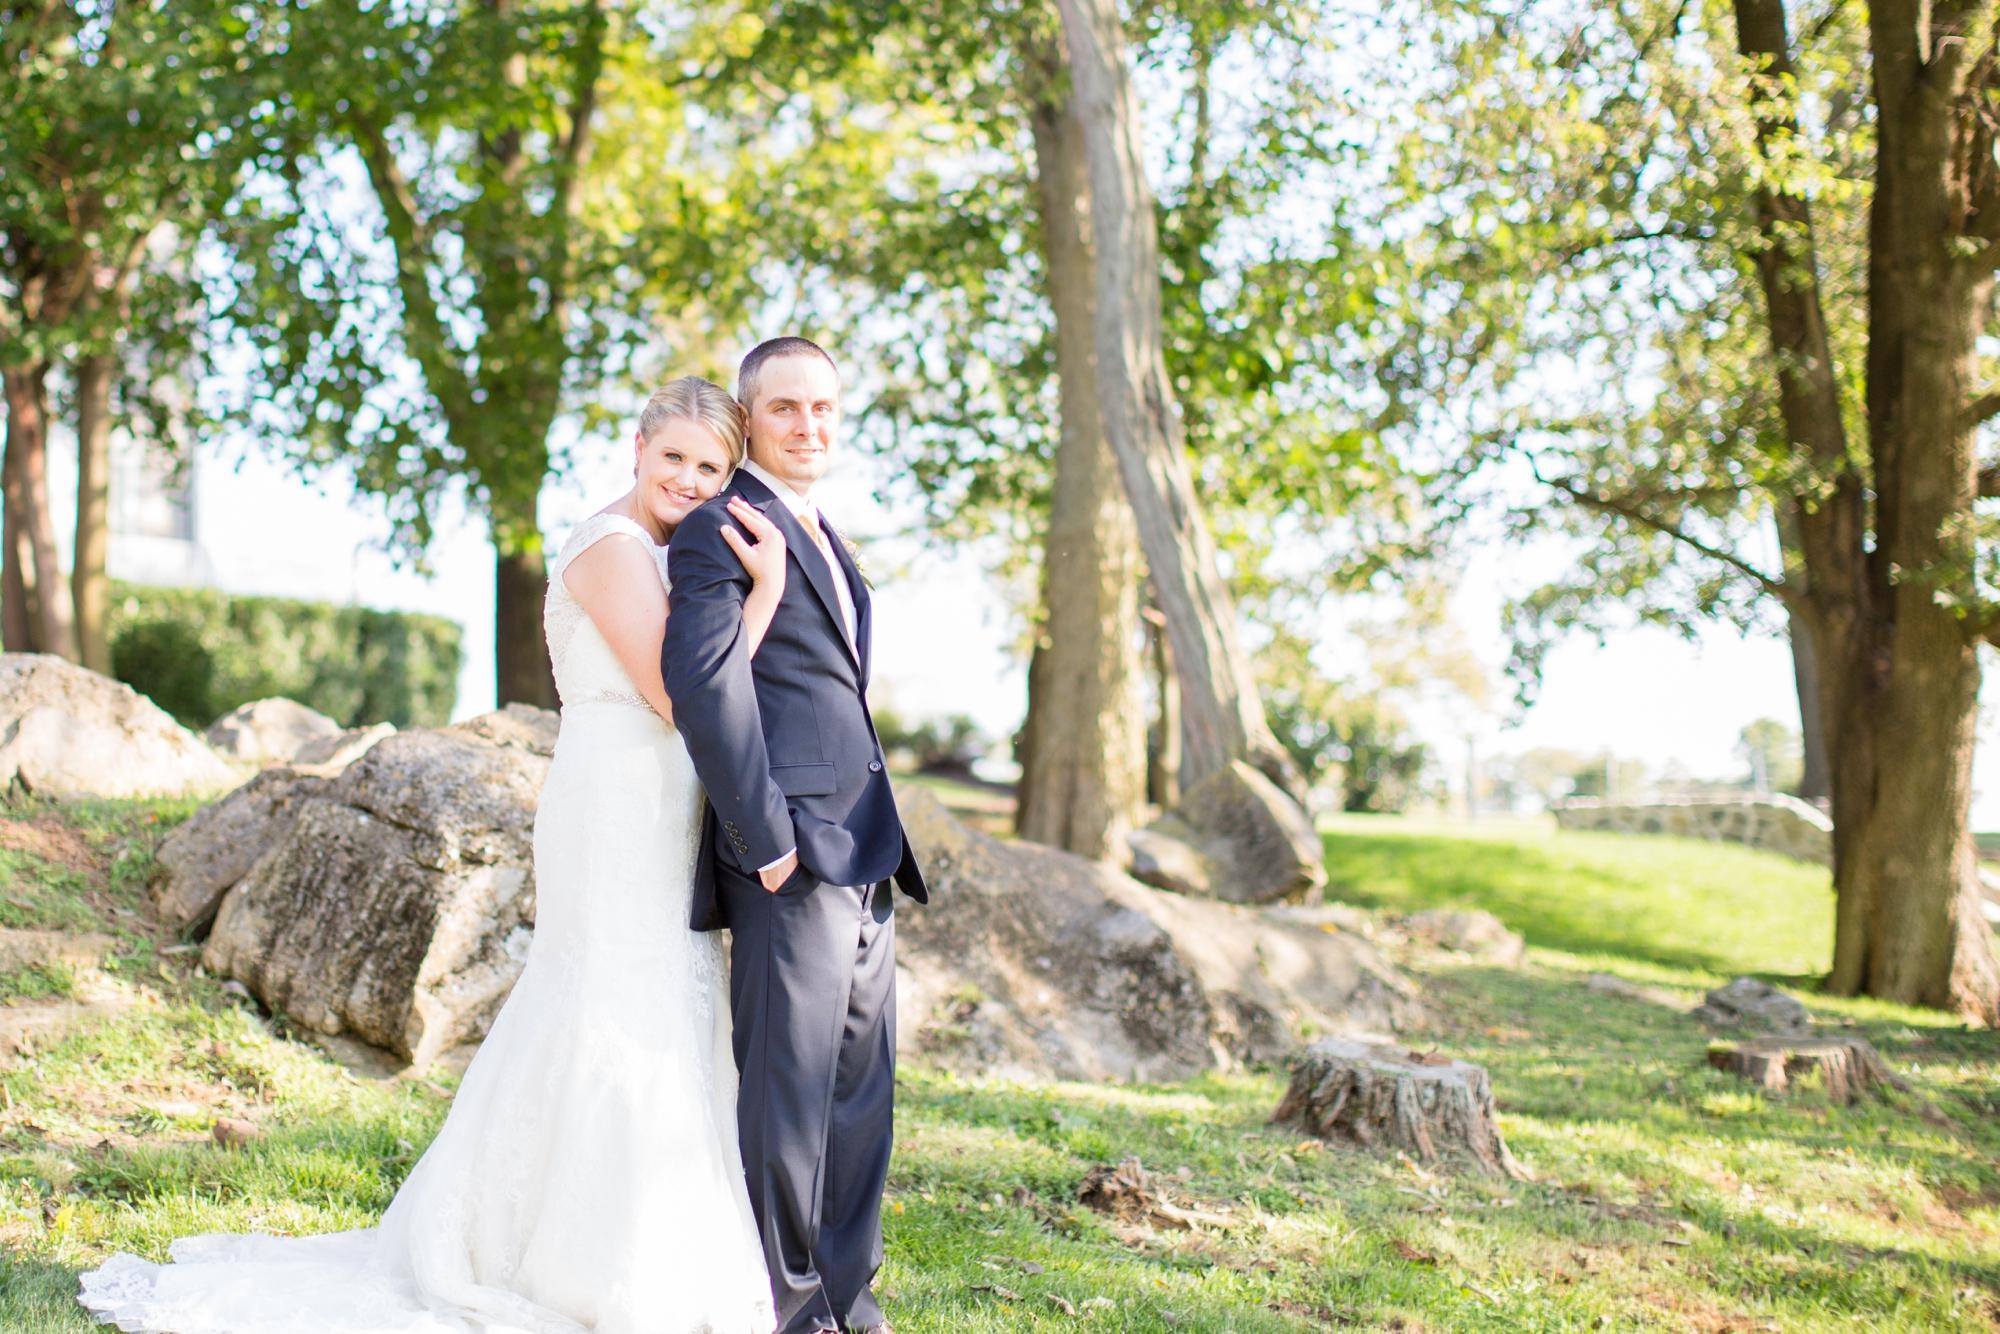 3-Miano Wedding Bride & Groom Portraits-565_anna grace photography maryland wedding photographer rockland estates.jpg